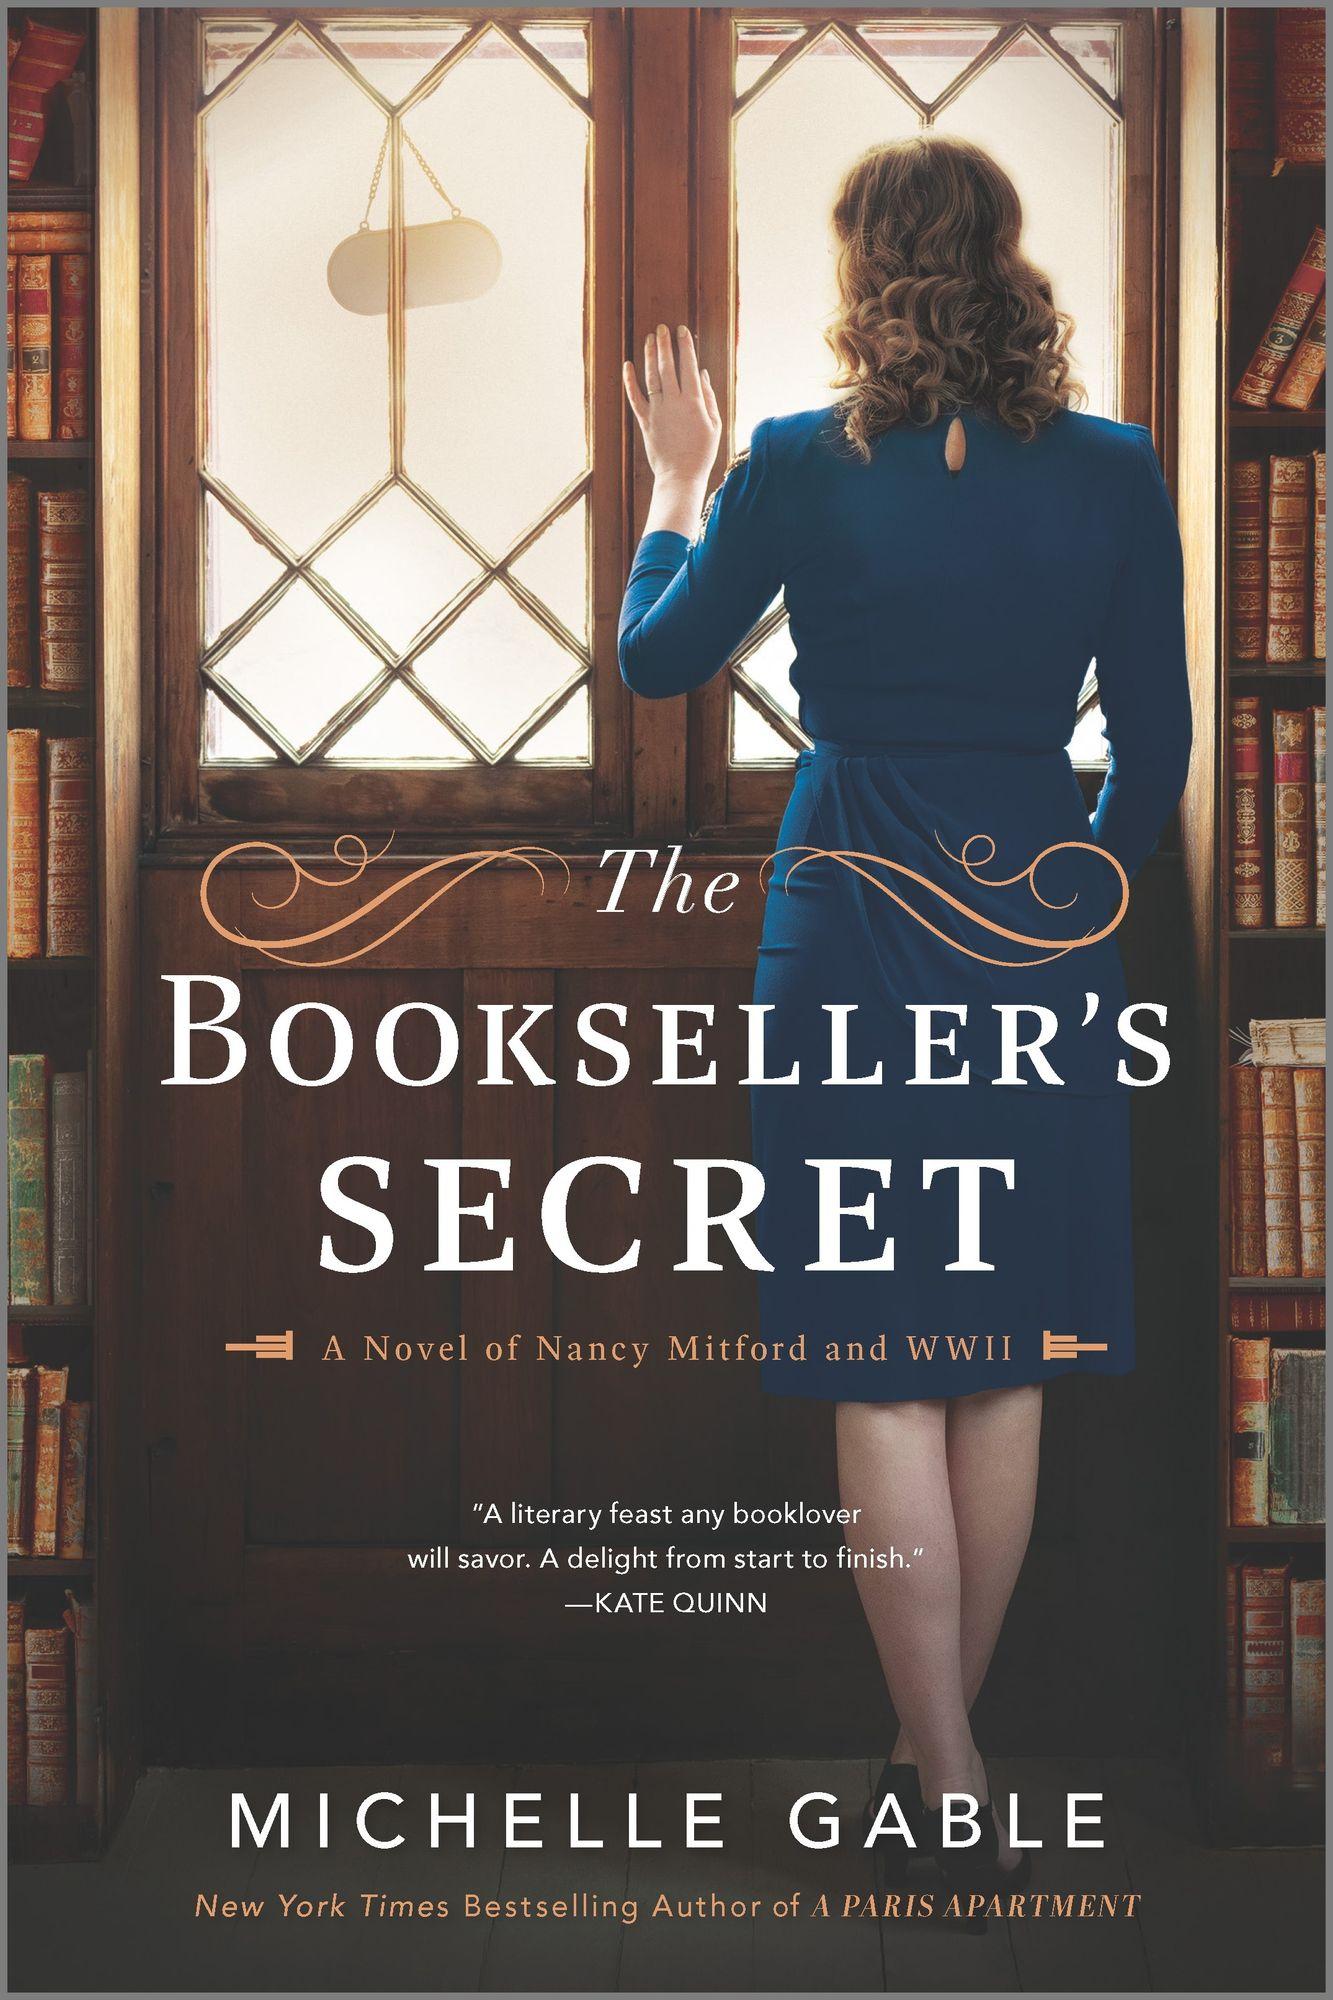 The Bookseller's Secret by Michelle Gable